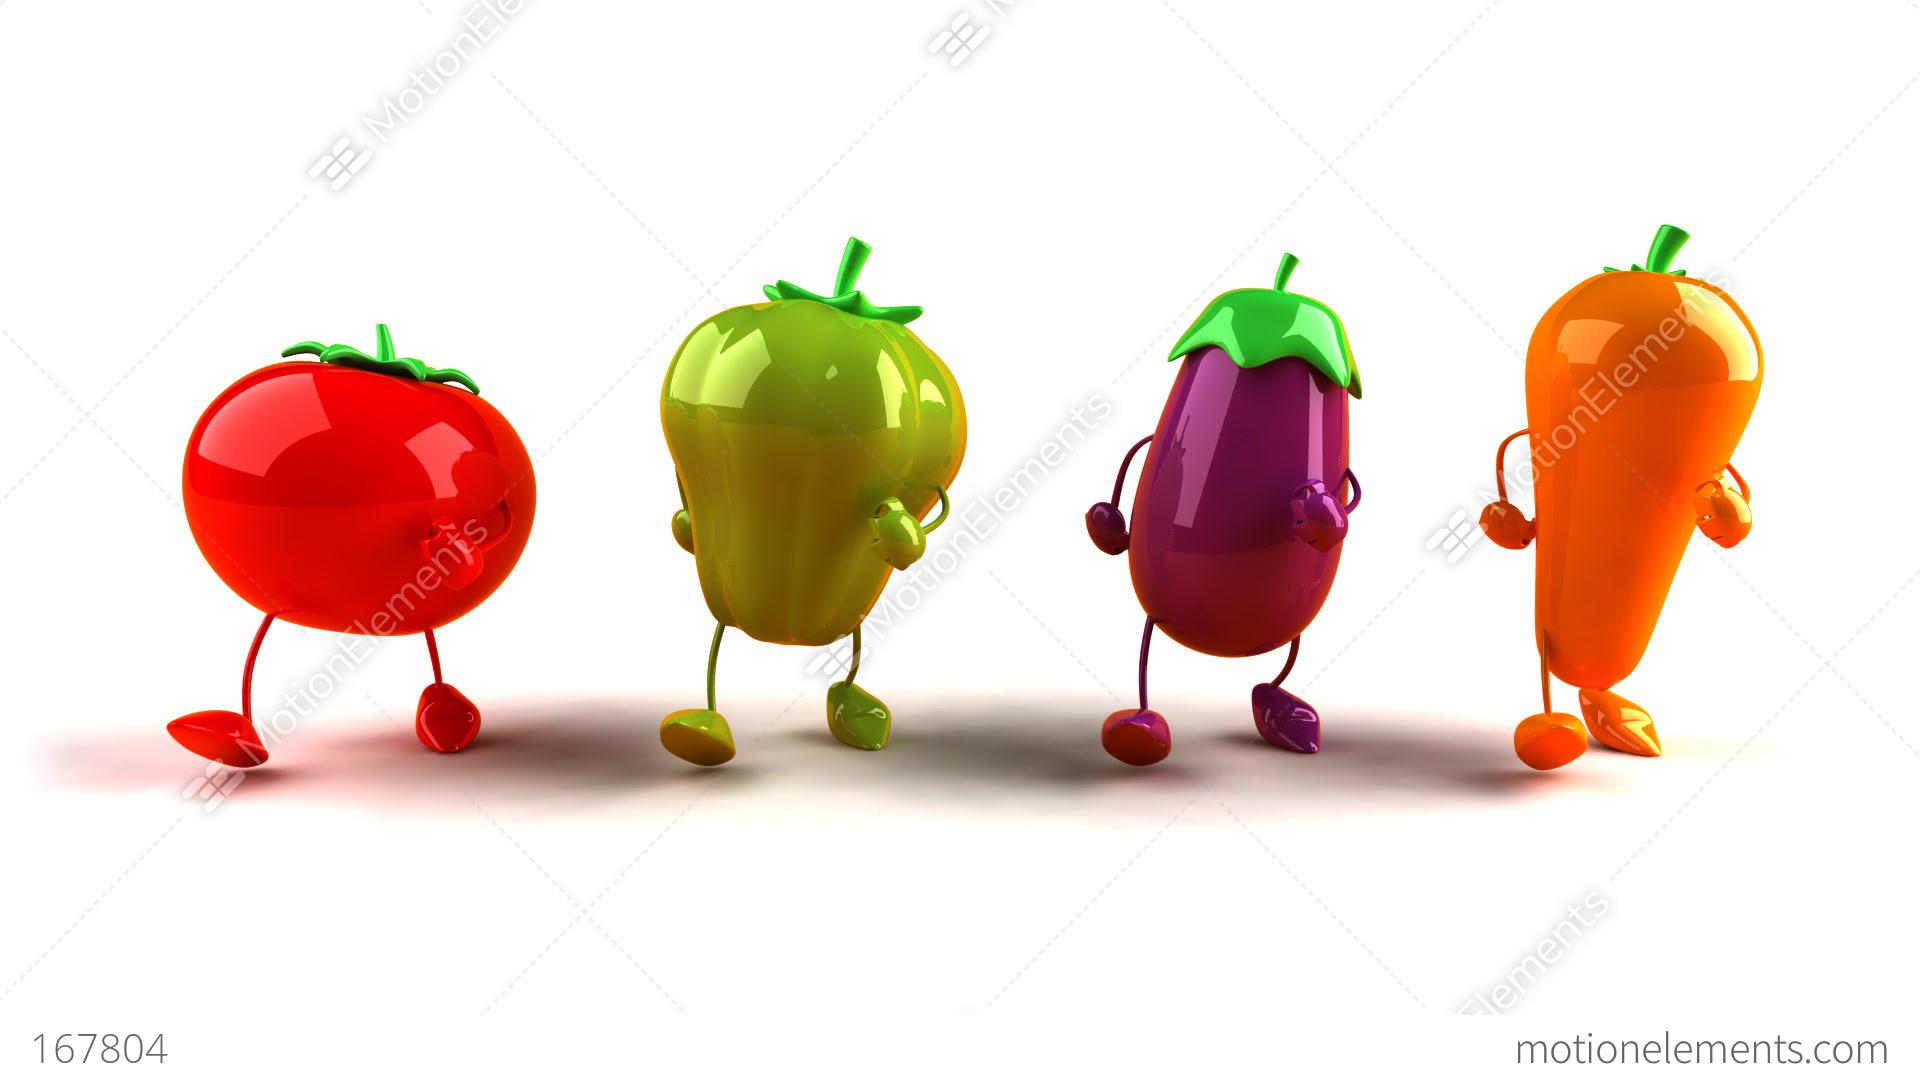 vegetables walk1  u0e20 u0e32 u0e1e u0e40 u0e04 u0e25 u0e37 u0e48 u0e2d u0e19 u0e44 u0e2b u0e27 167804 Drawings of Fruits and Vegetables Fruit and Vegetable Border Clip Art